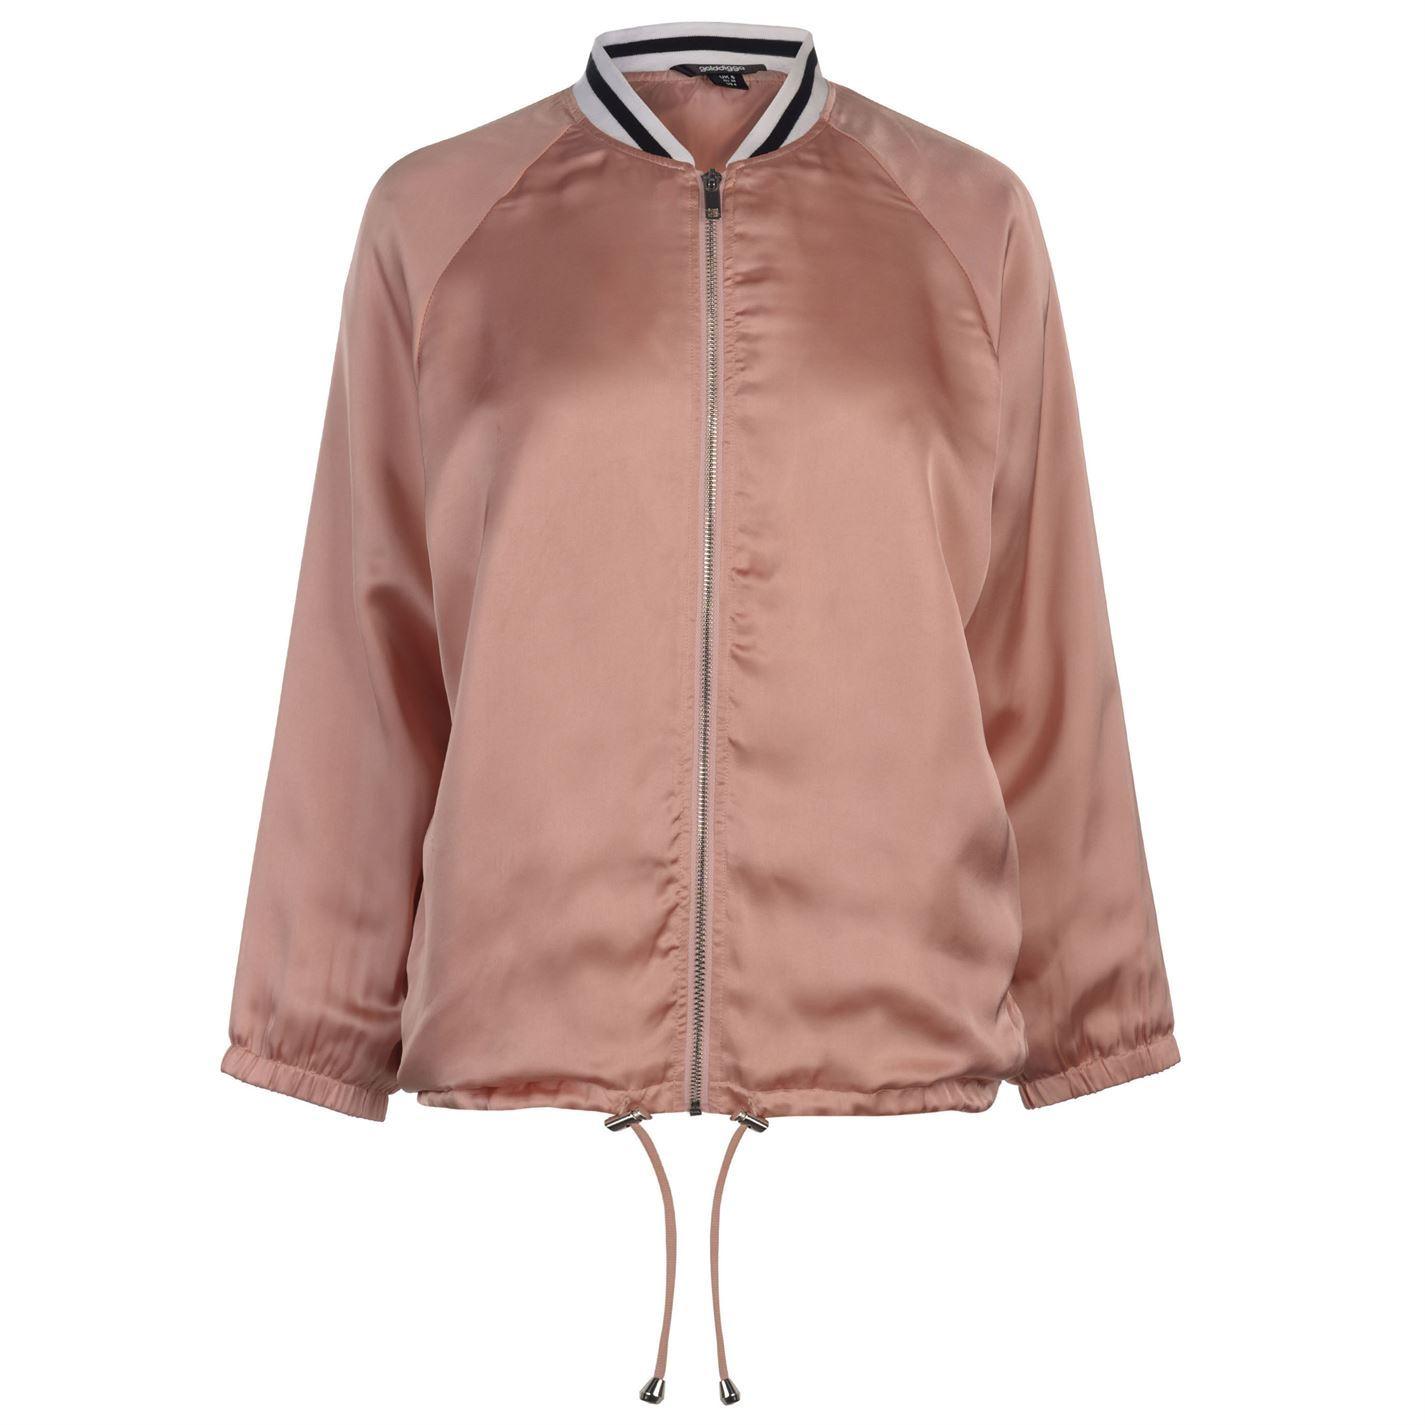 Golddigga-Bomber-Jacket-Womens-Coats-Outerwear thumbnail 9